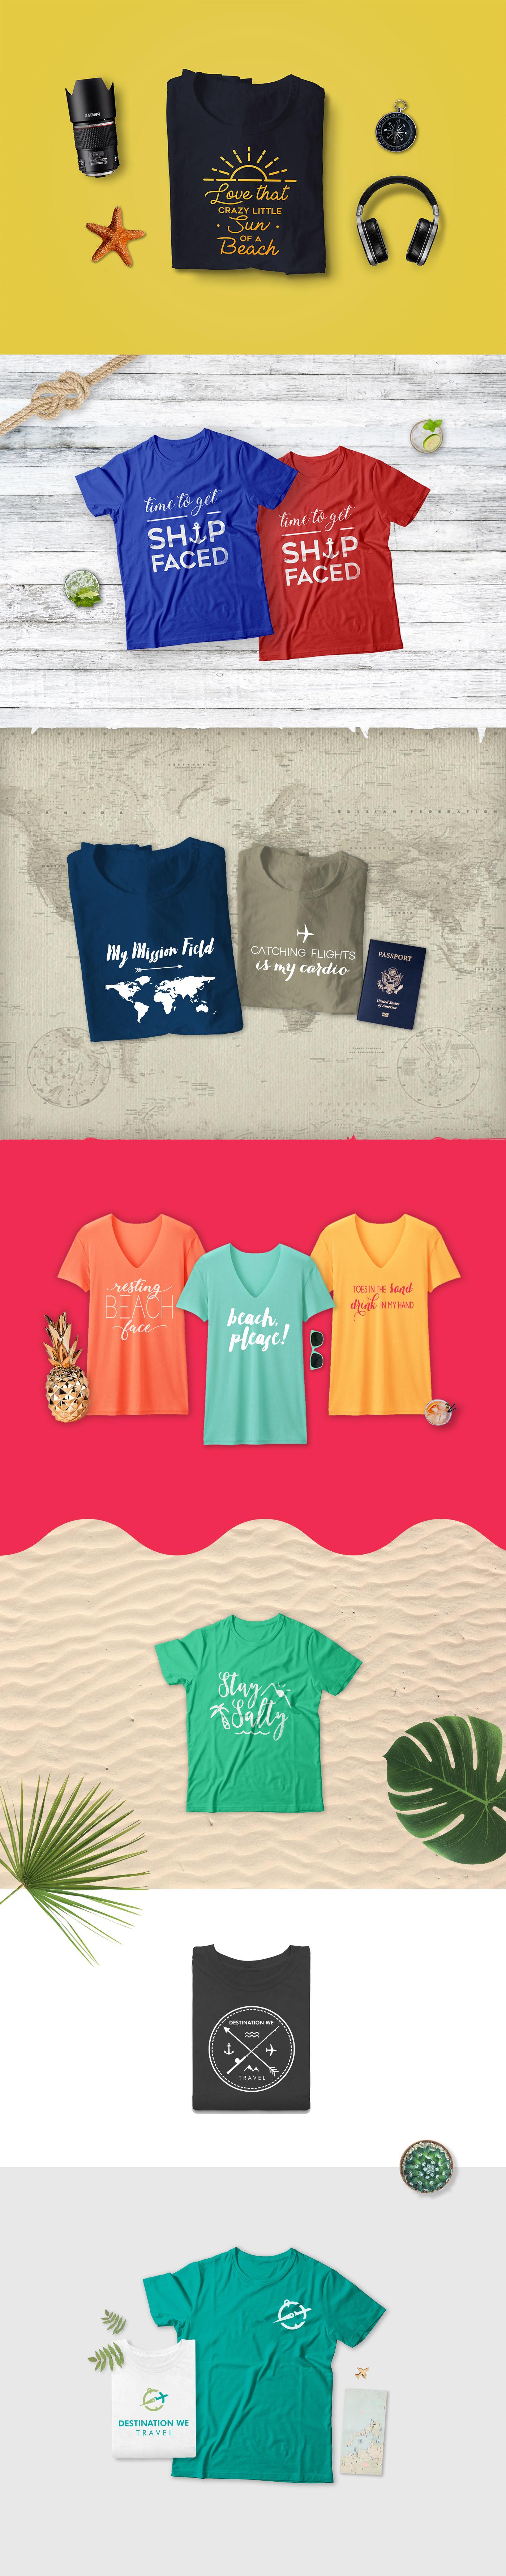 Travel T-Shirt Design salty beach funny t-shirts